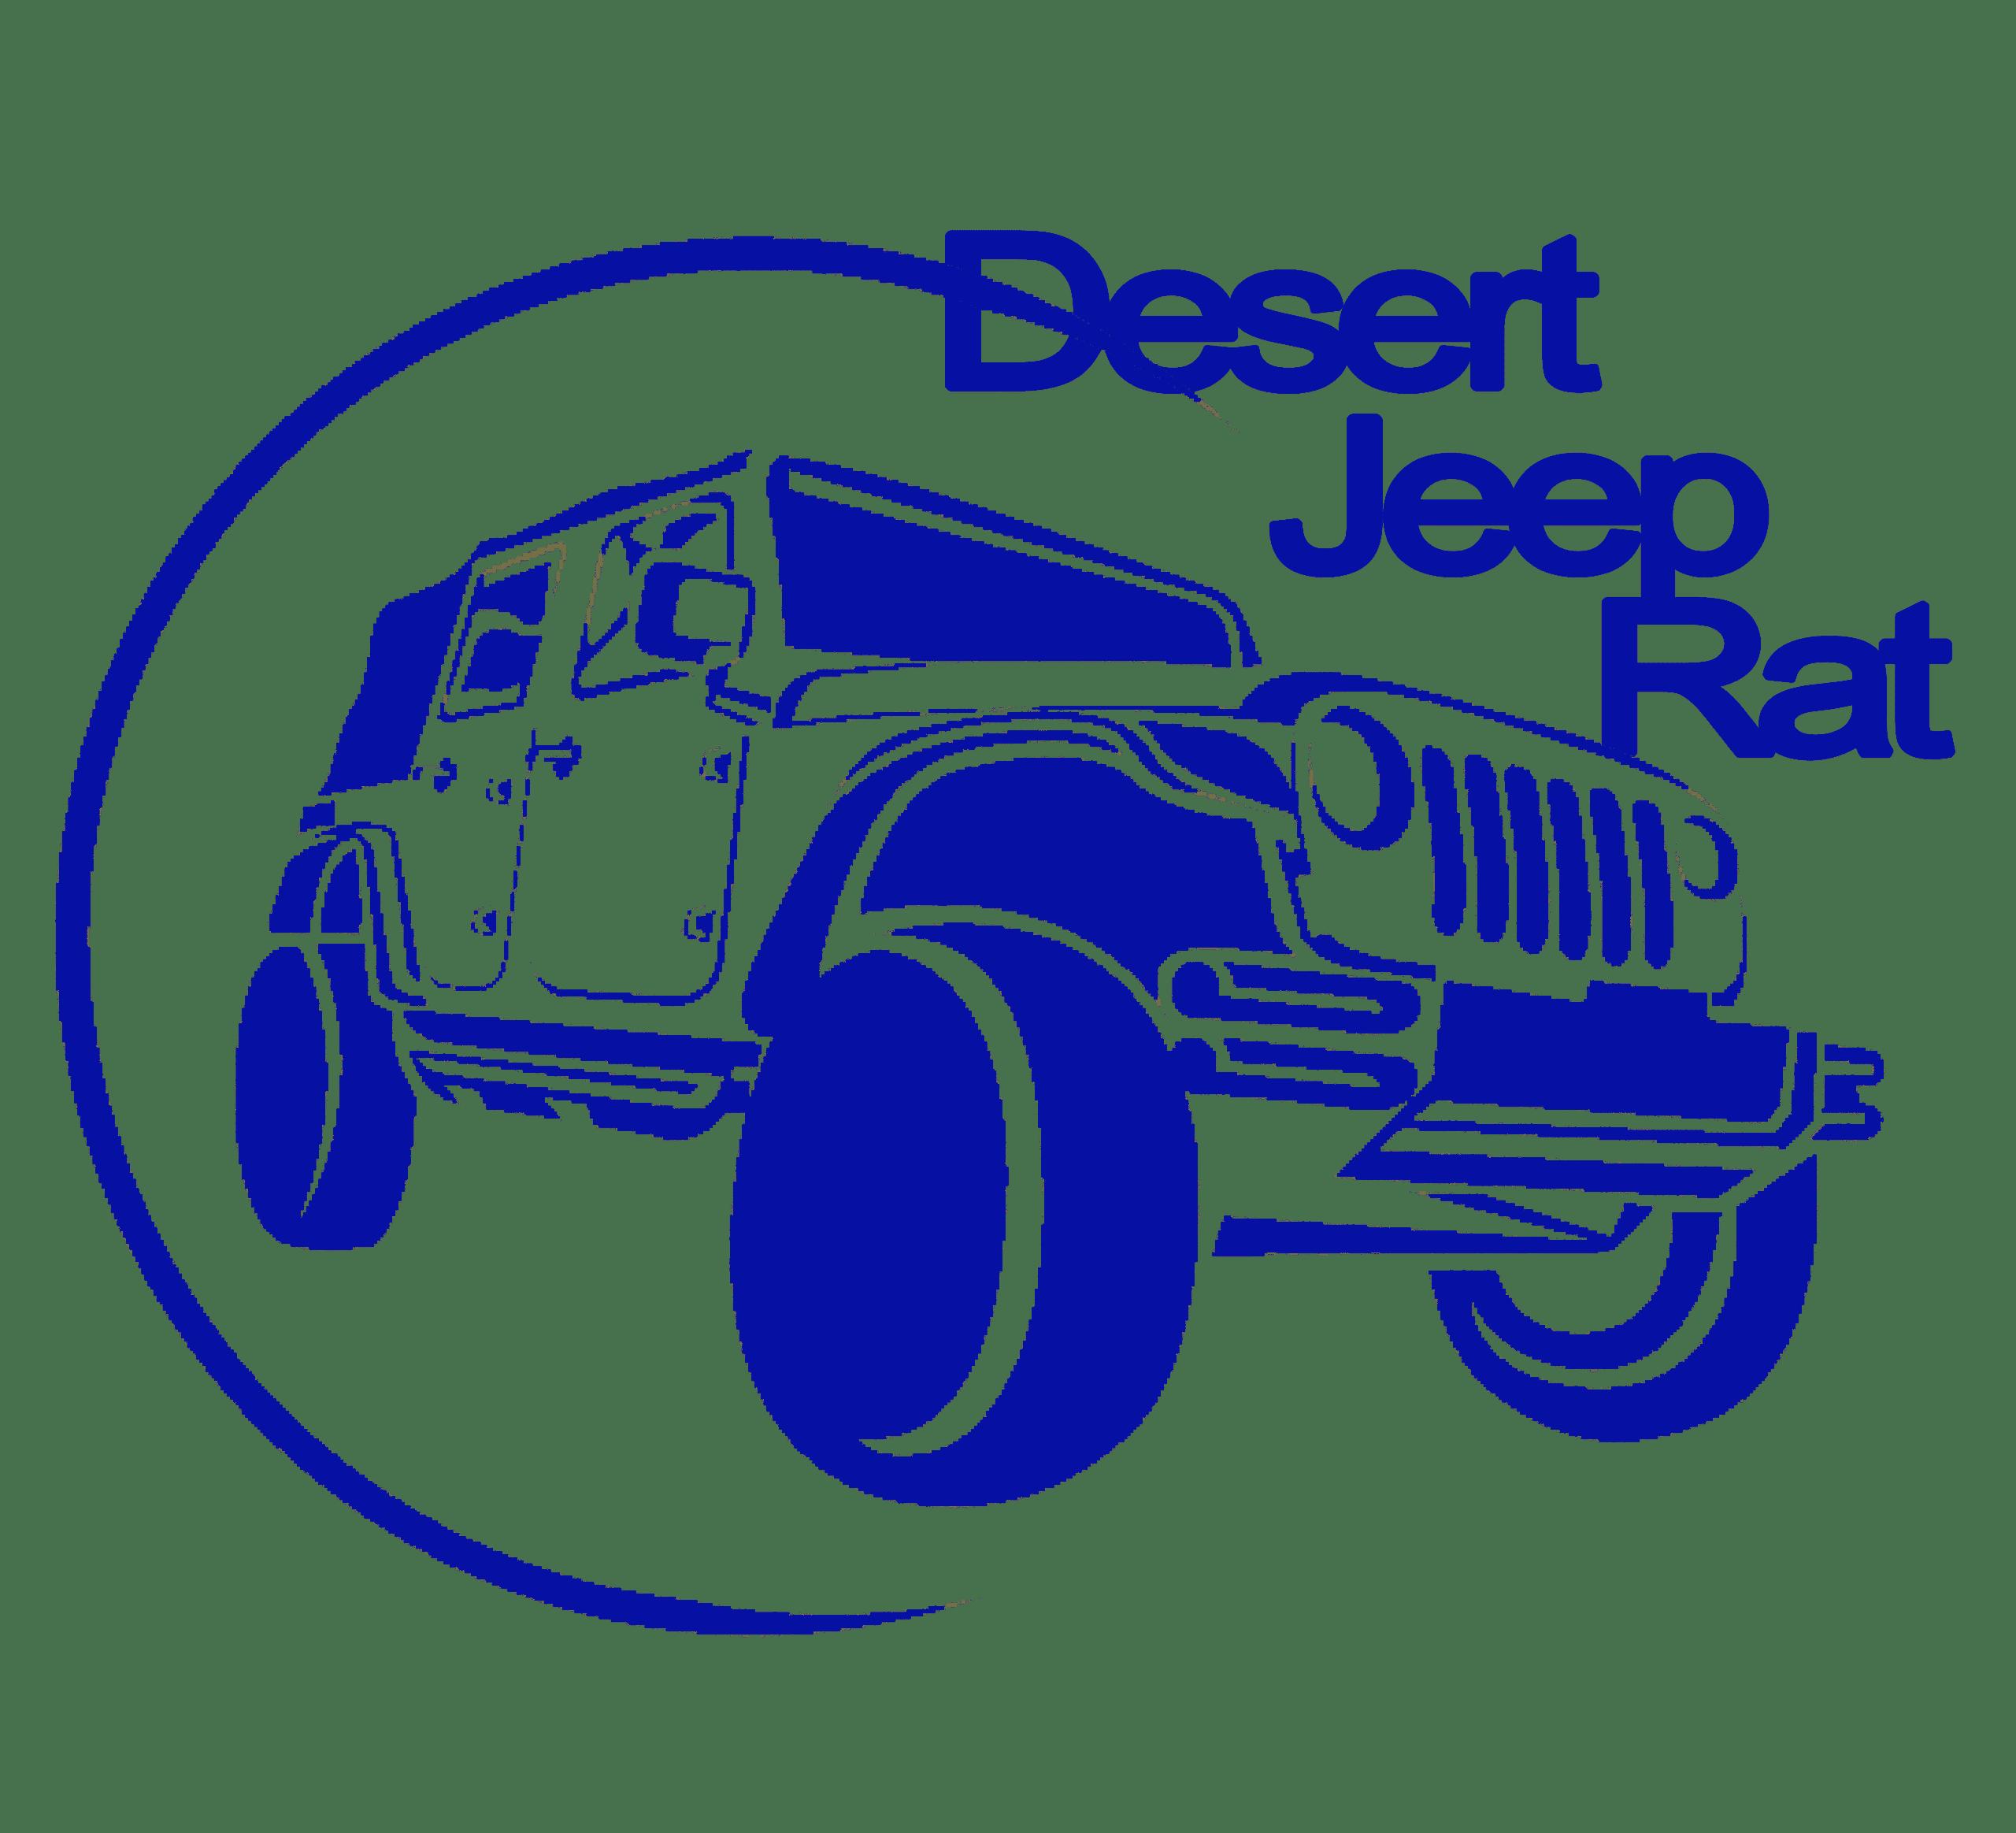 X Bull 13k Winch Install On The Blue Burro Desert Jeep Rat Wiring